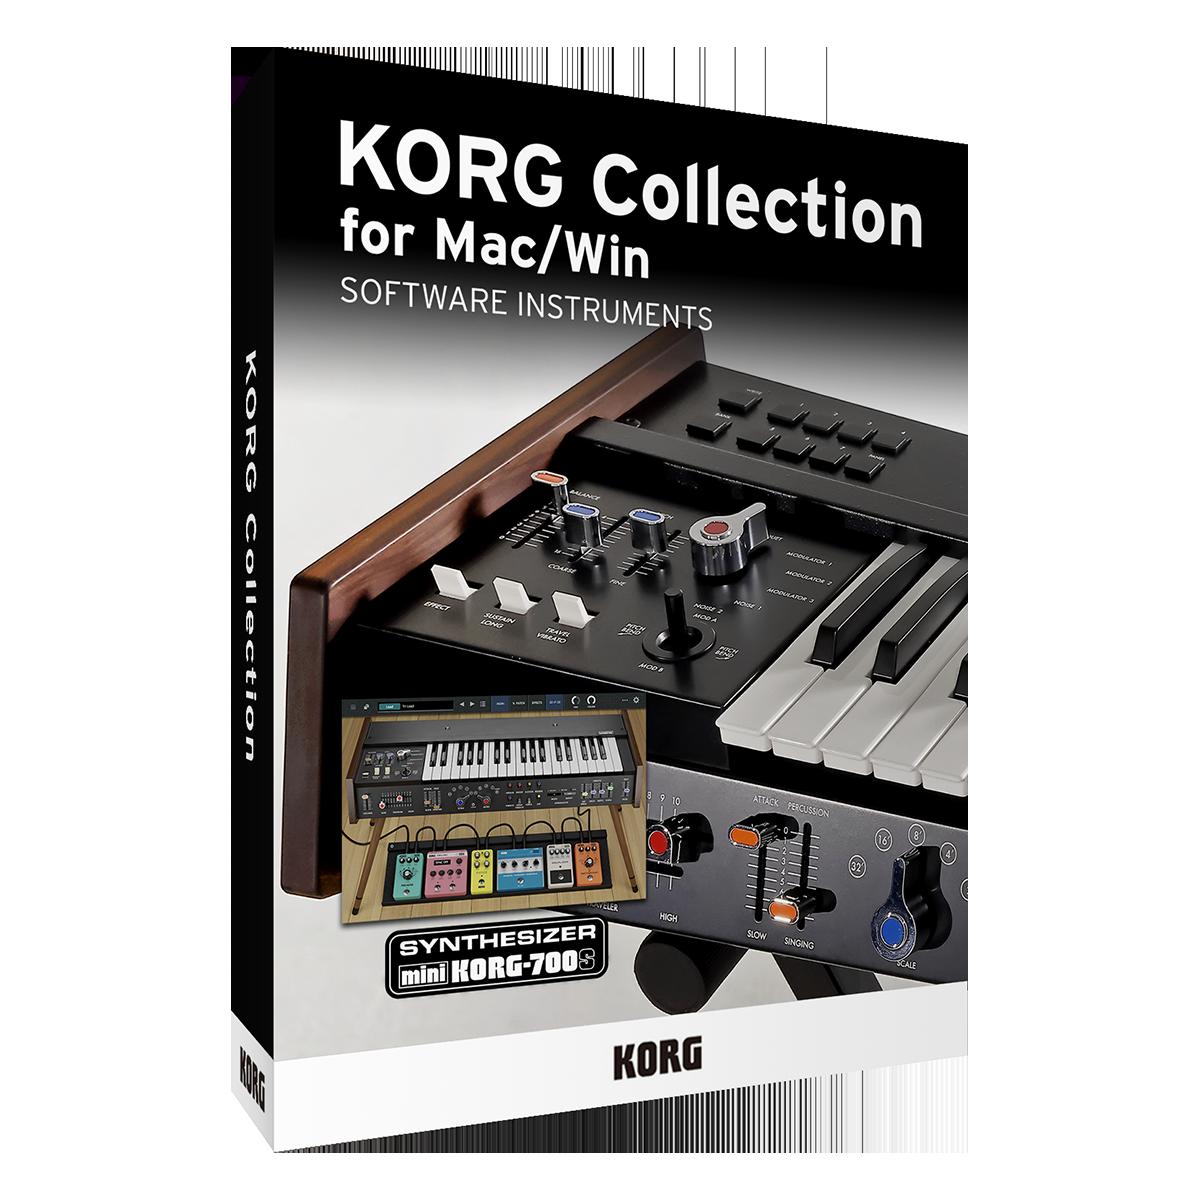 KORG Collection 3 - miniKORG 700S